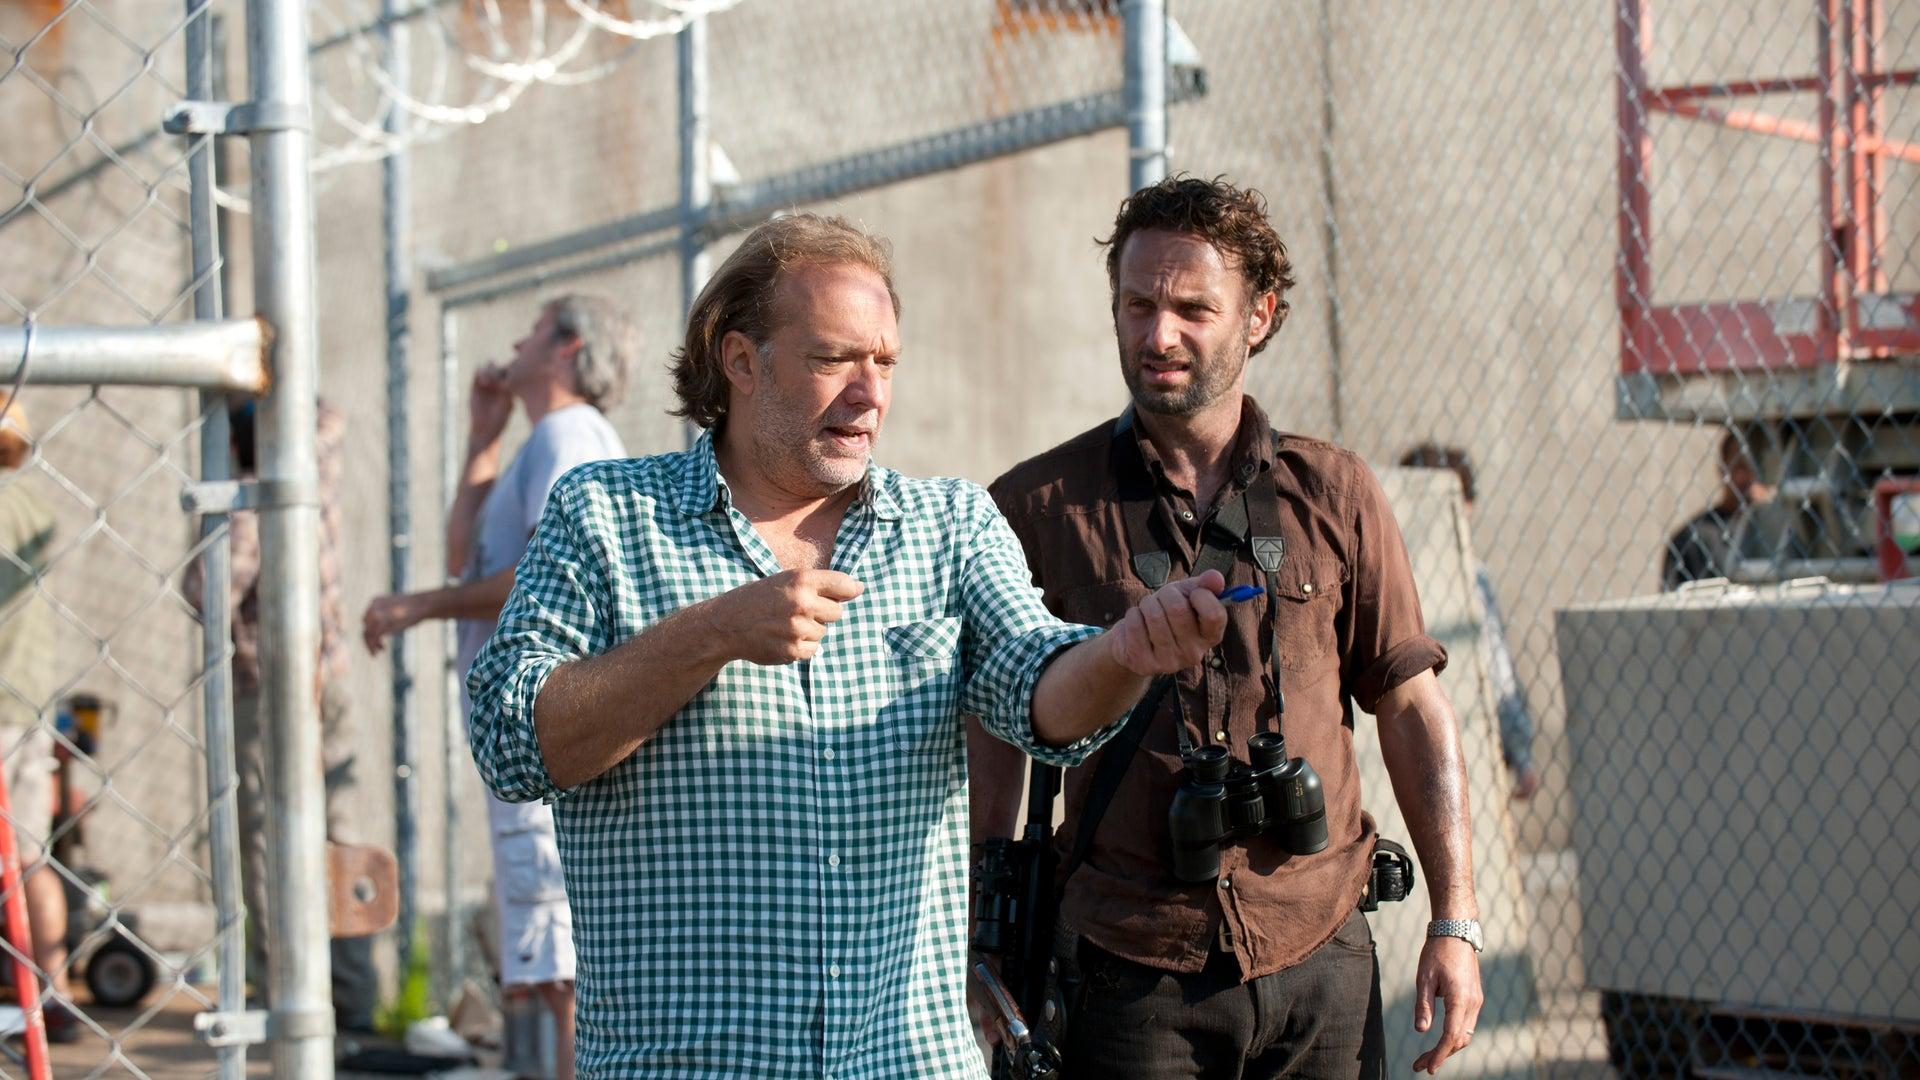 CoExecutive Producer/SFX Makeup Supervisor Greg Nicotero and Rick Grimes (Andrew Lincoln), The Walking Dead